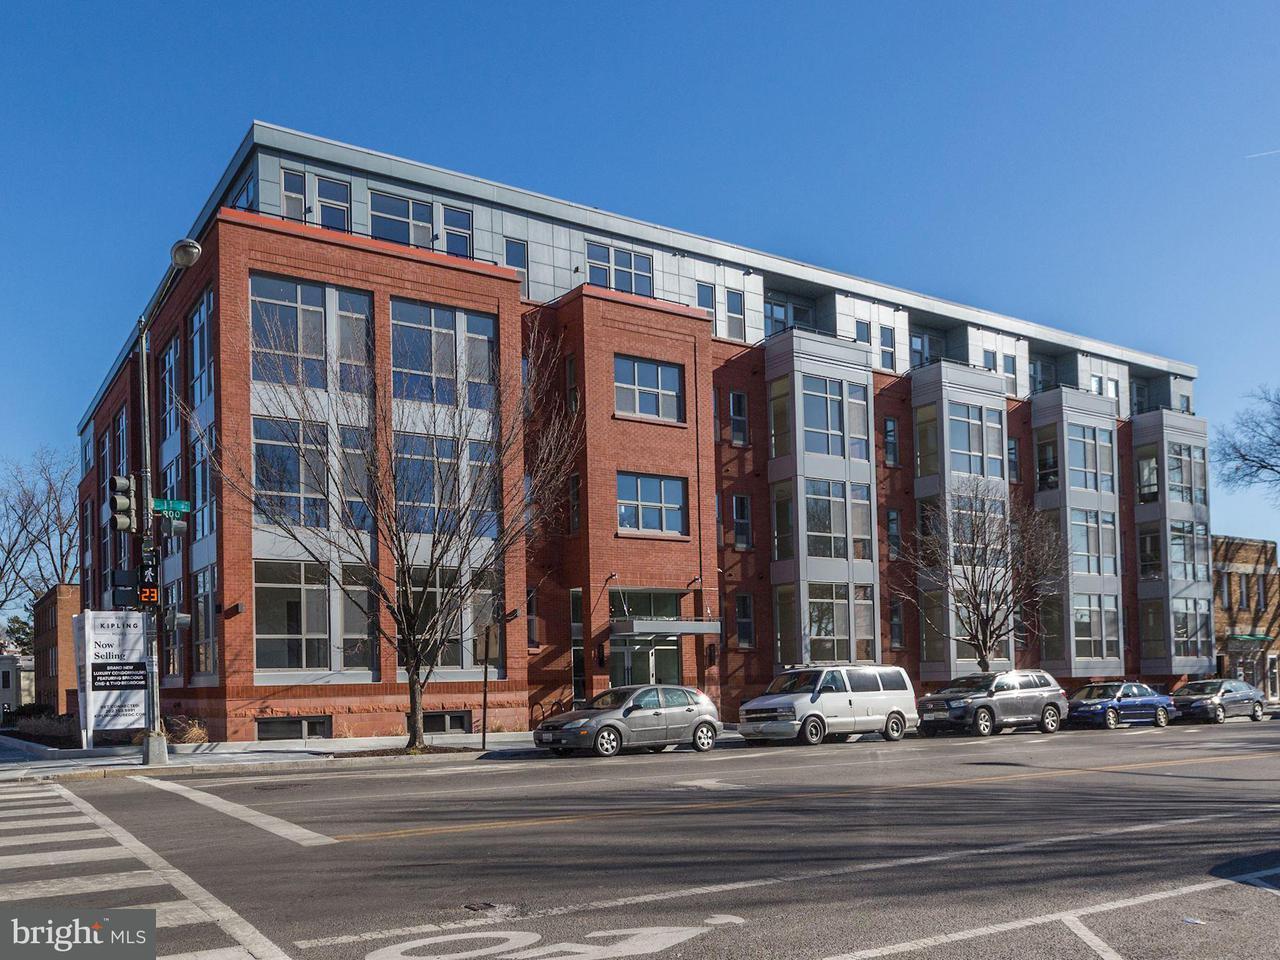 Condominium for Sale at 900 11th St Se #311 900 11th St Se #311 Washington, District Of Columbia 20003 United States